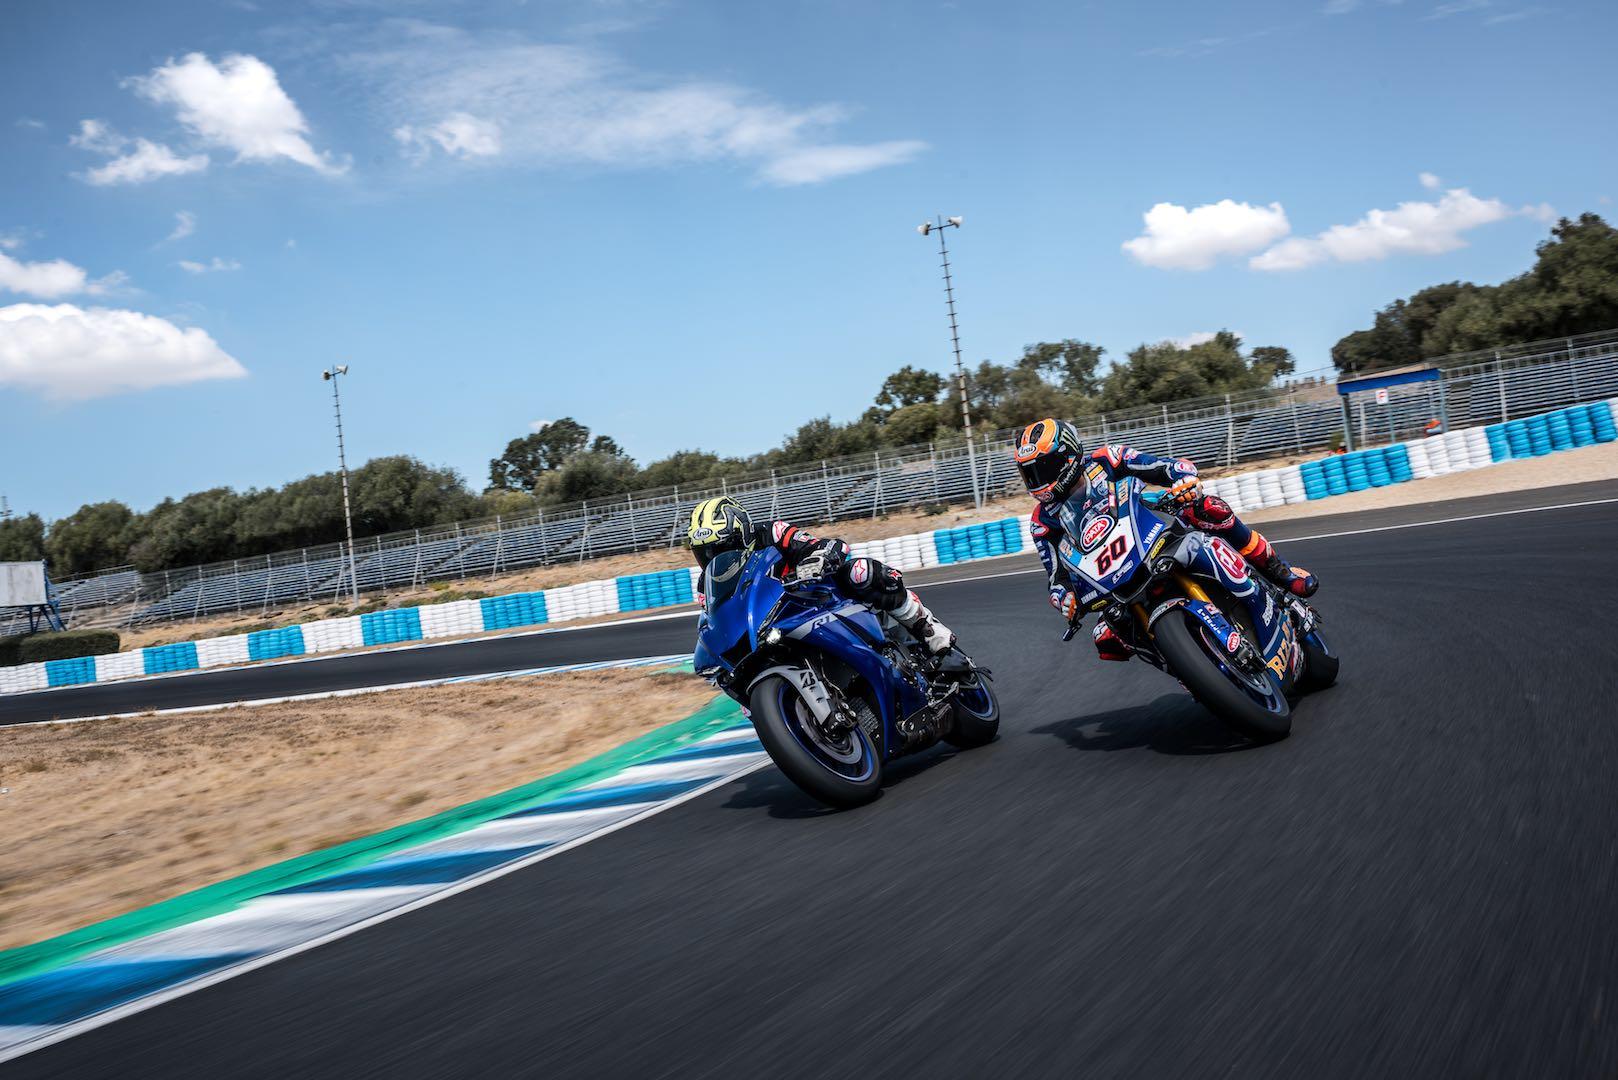 2020 Yamaha R1 with Michael van der Mark